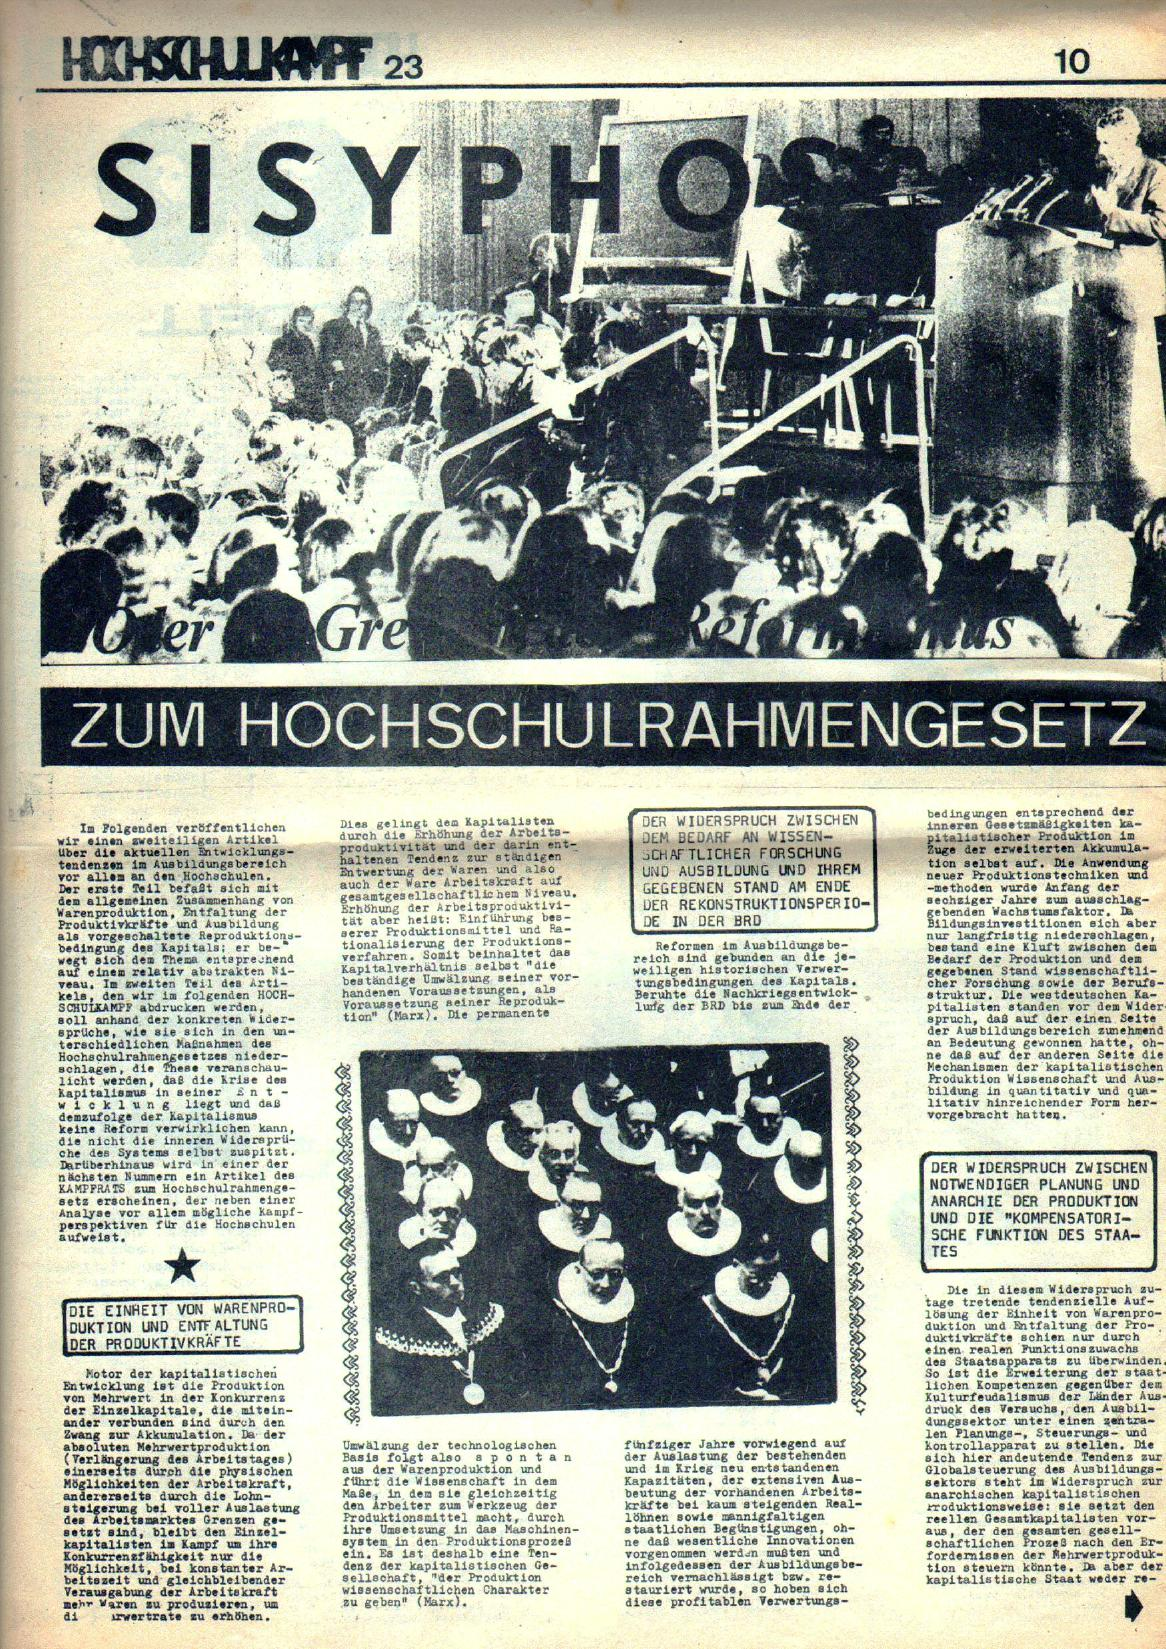 Berlin_Hochschulkampf_1971_23_10